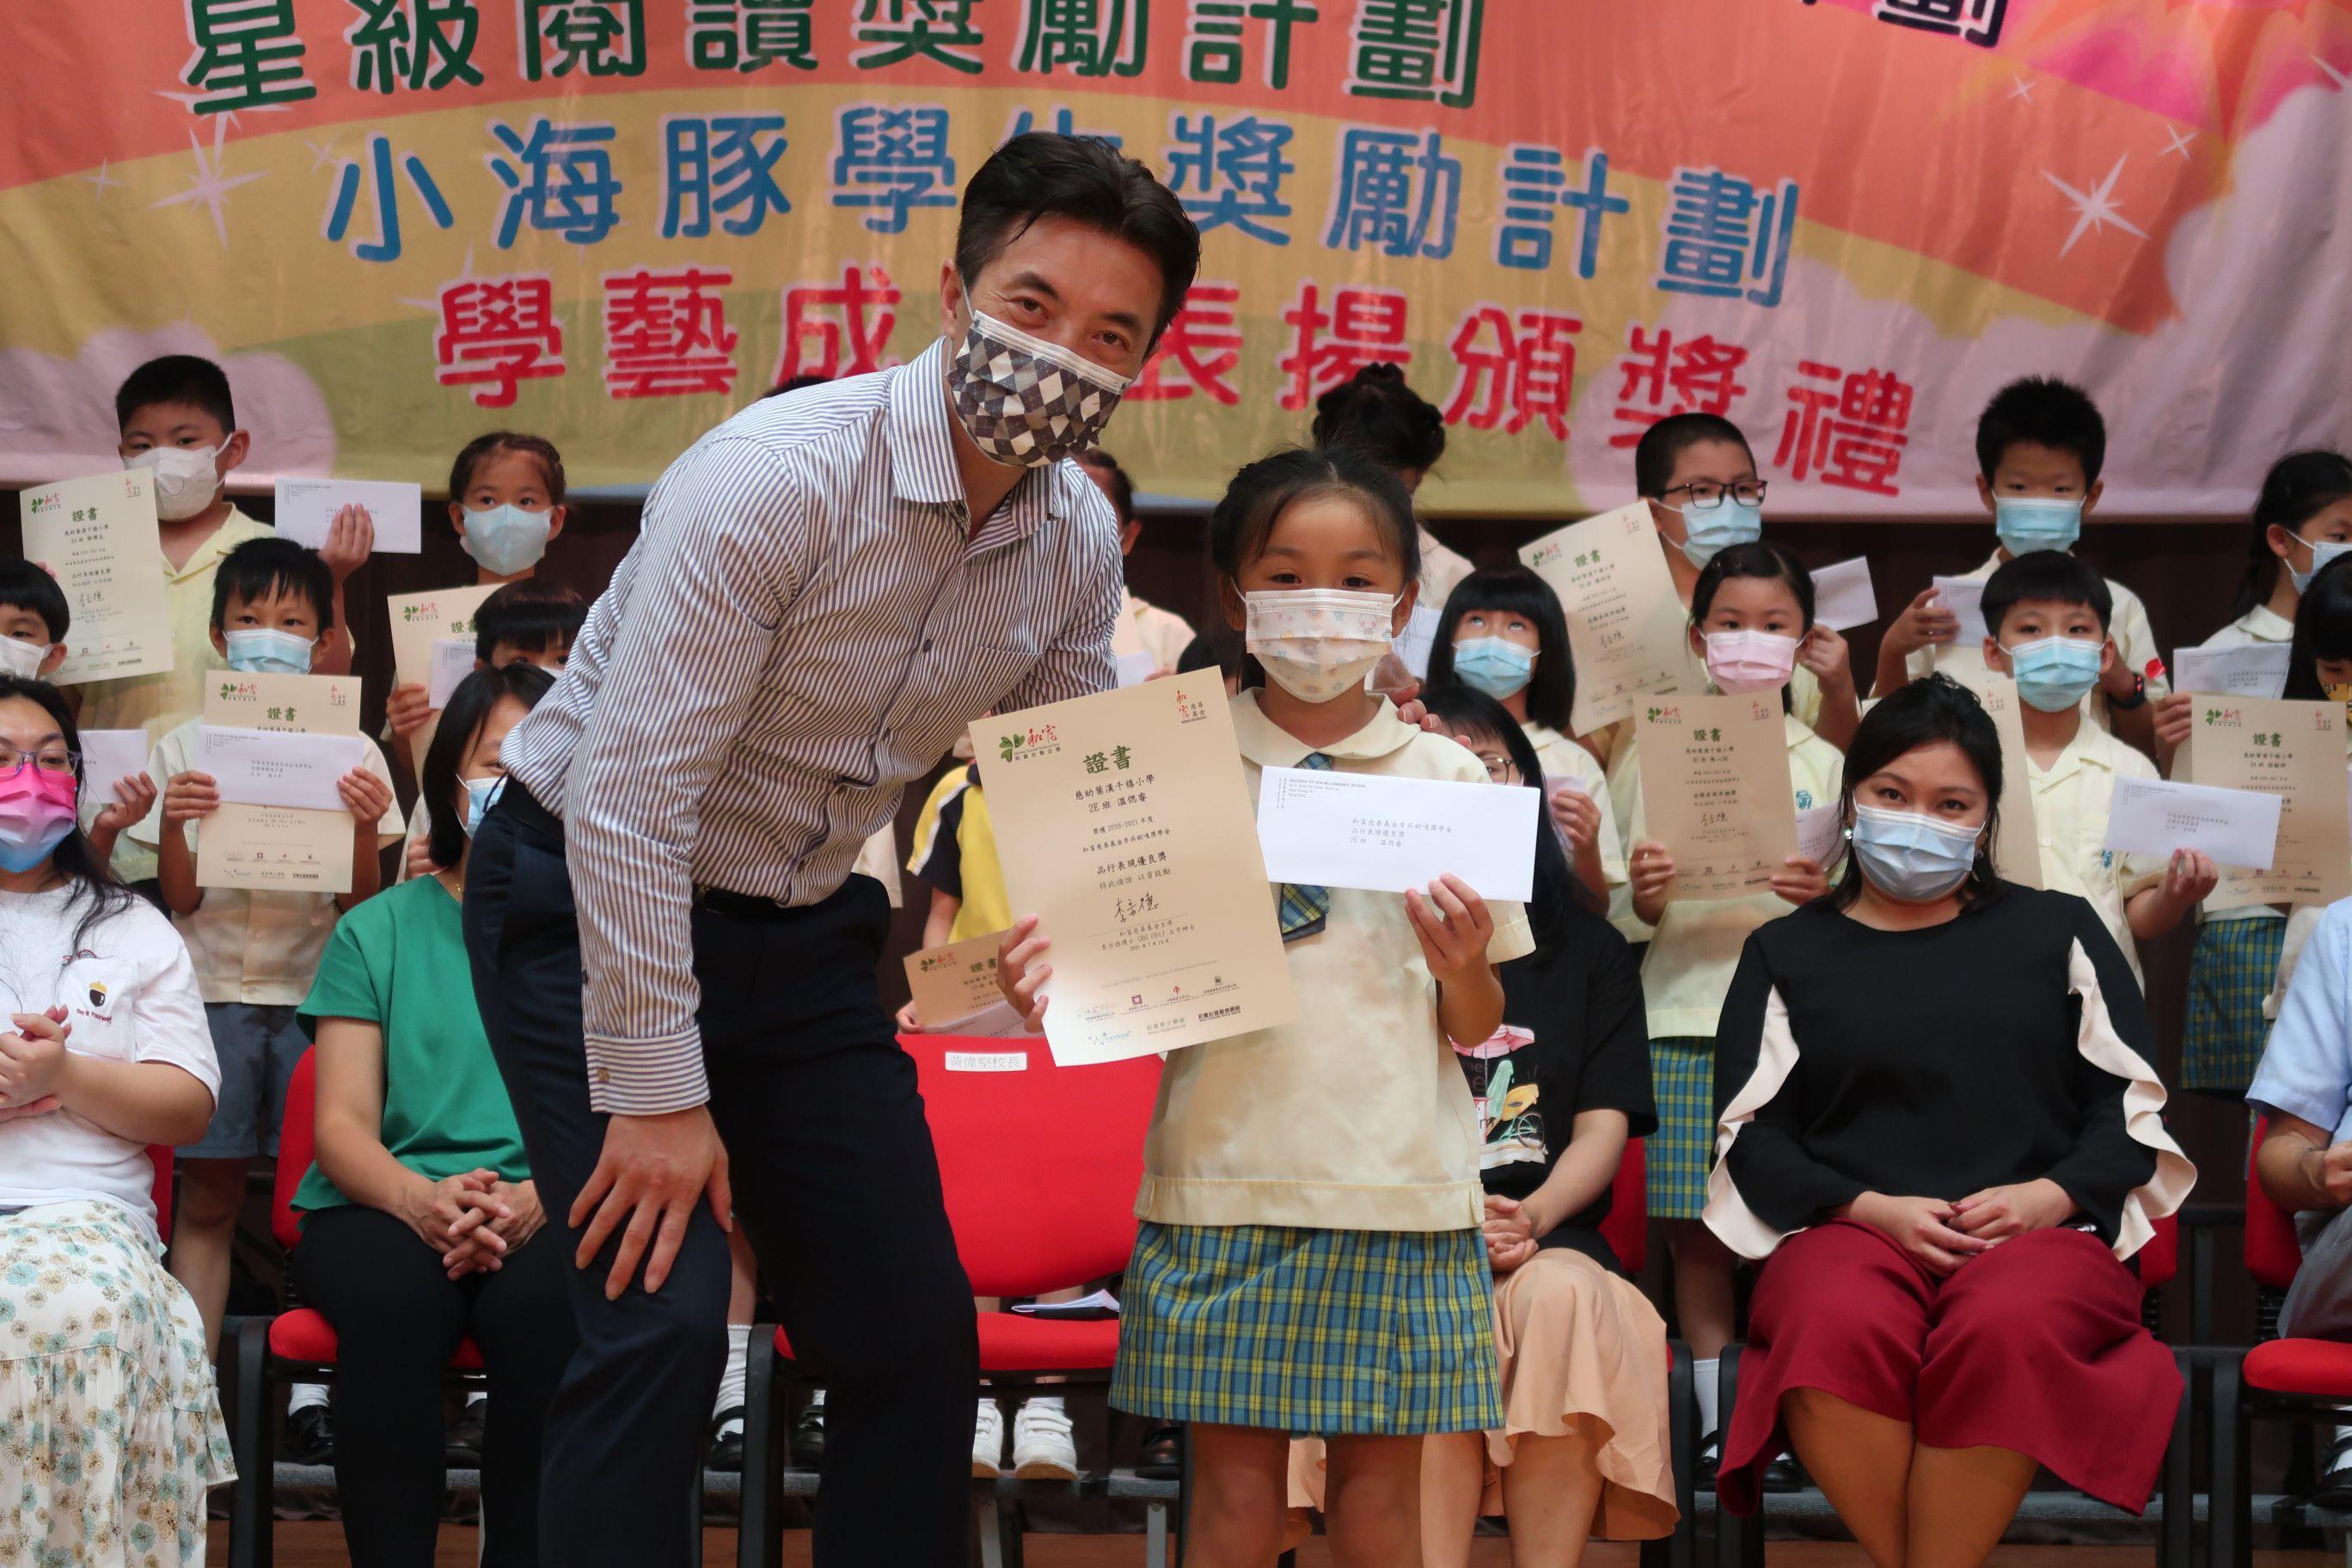 https://syh.edu.hk/sites/default/files/img_5959_1.jpg